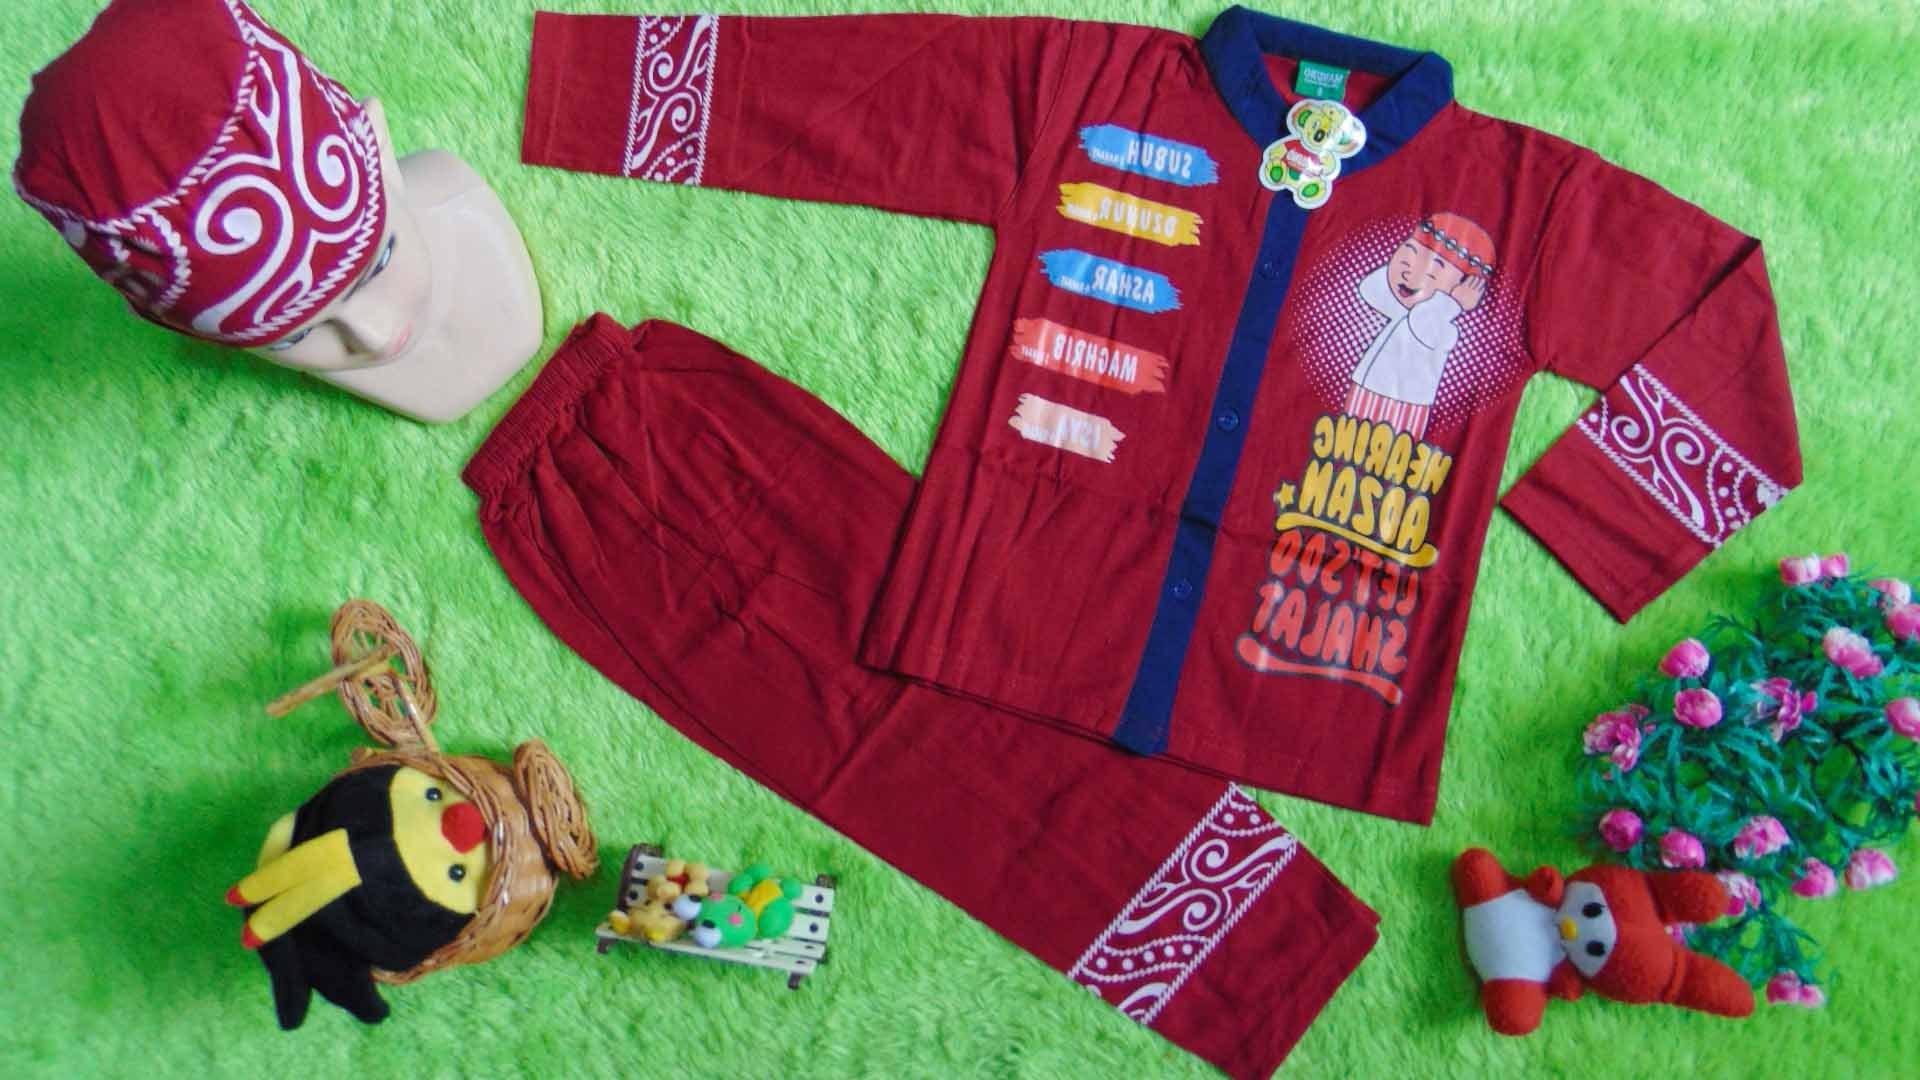 Ide Baju Lebaran Anak 1 Tahun Mndw Paling Laris Setelan Baju Koko Muslim Lebaran Ramadhan